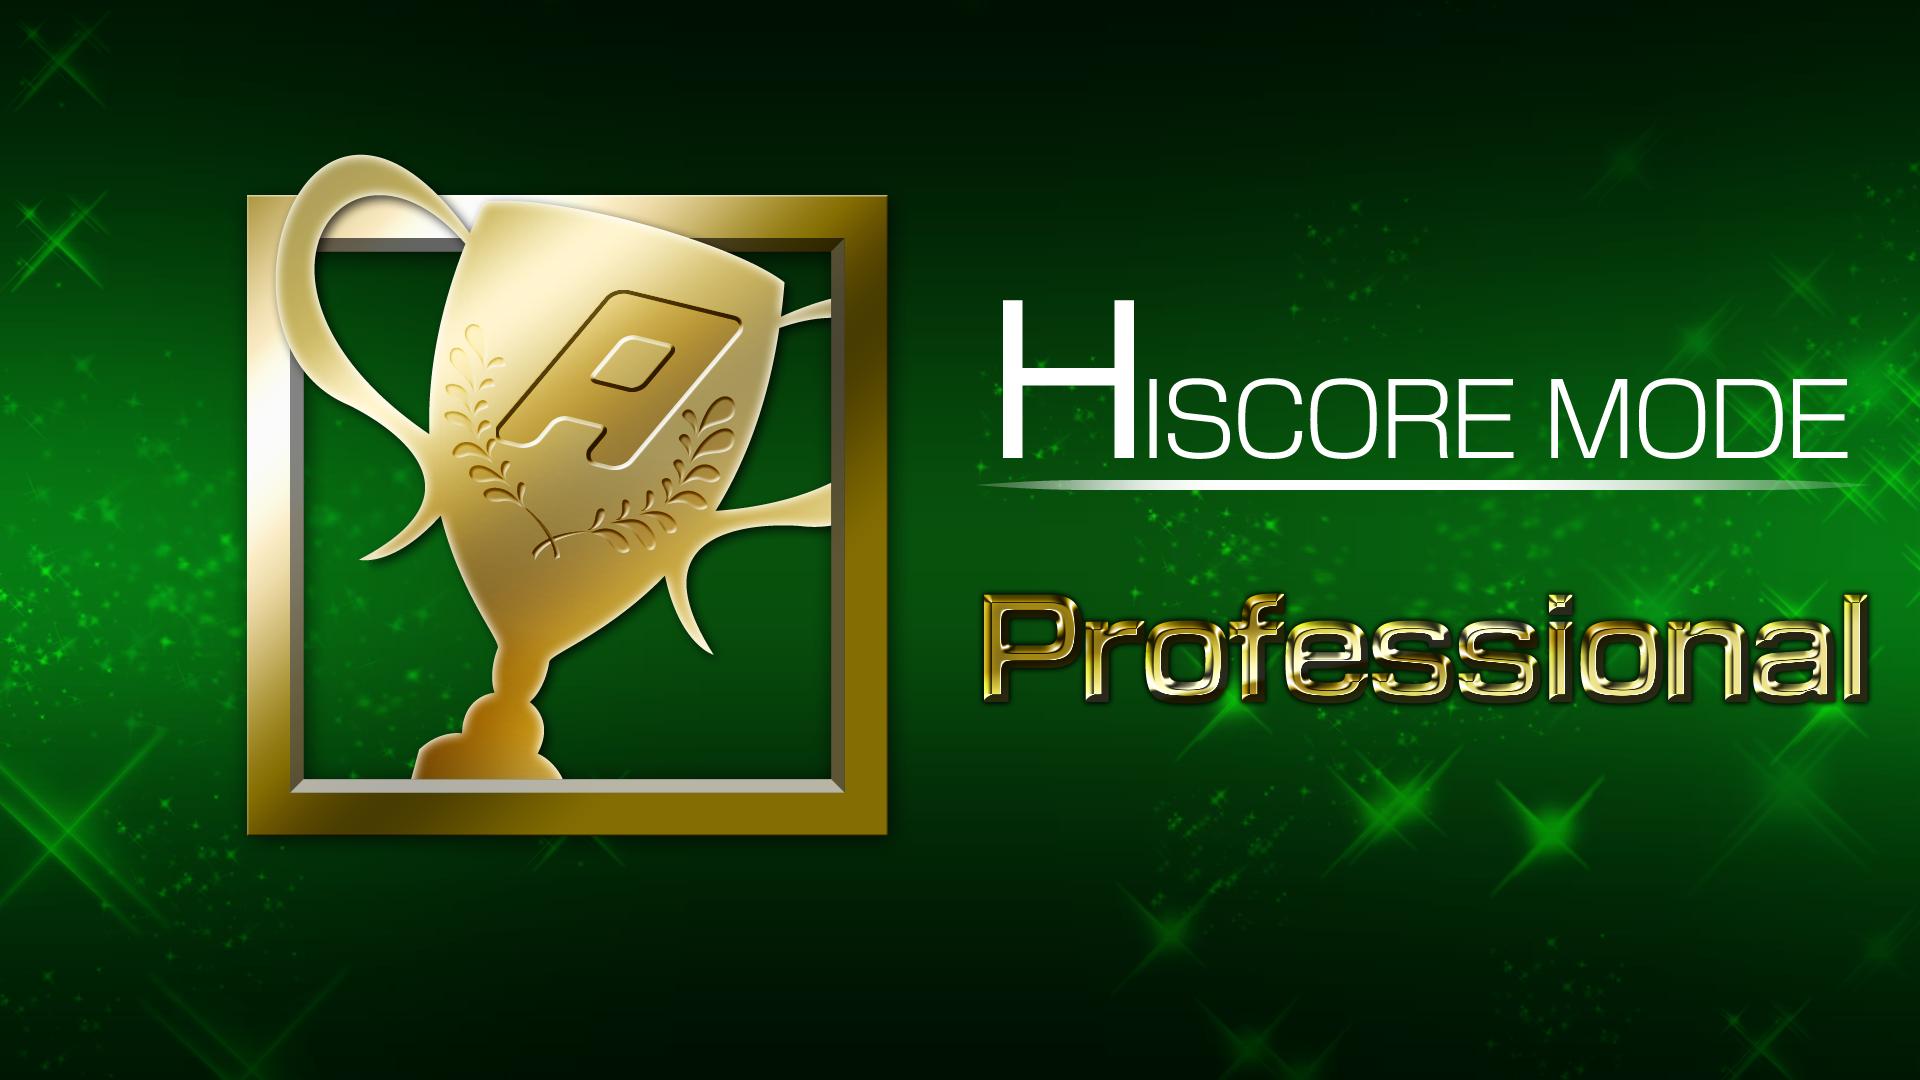 Icon for HI SCORE MODE 60,000 points